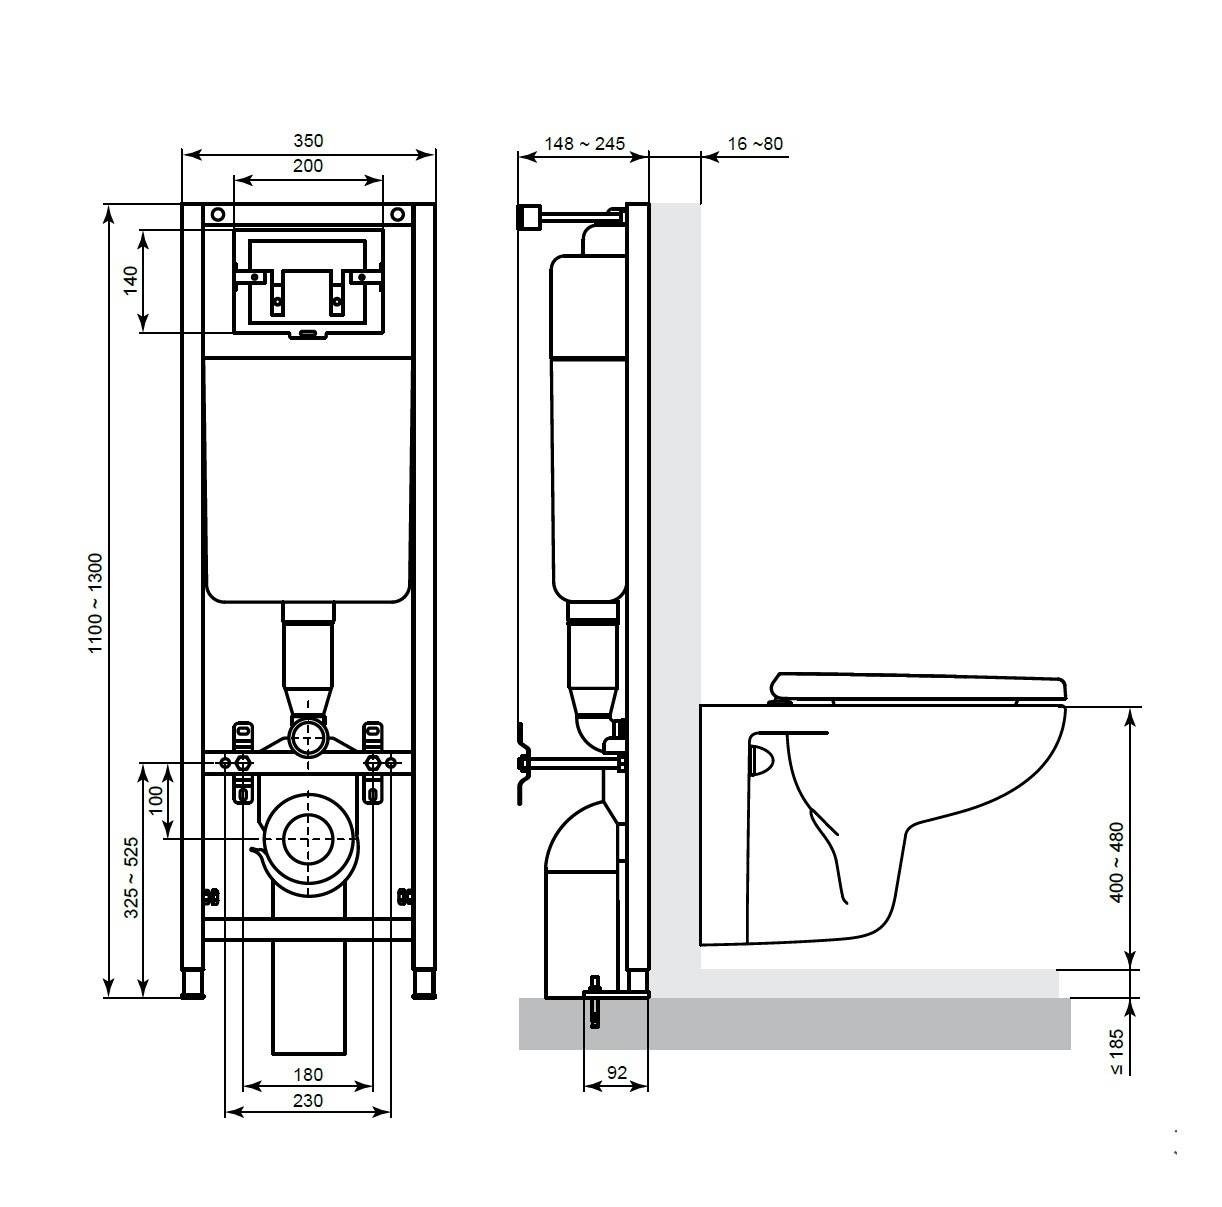 Система инсталляции для унитаза: видео-инструкция по монтажу своими руками, цена, фото